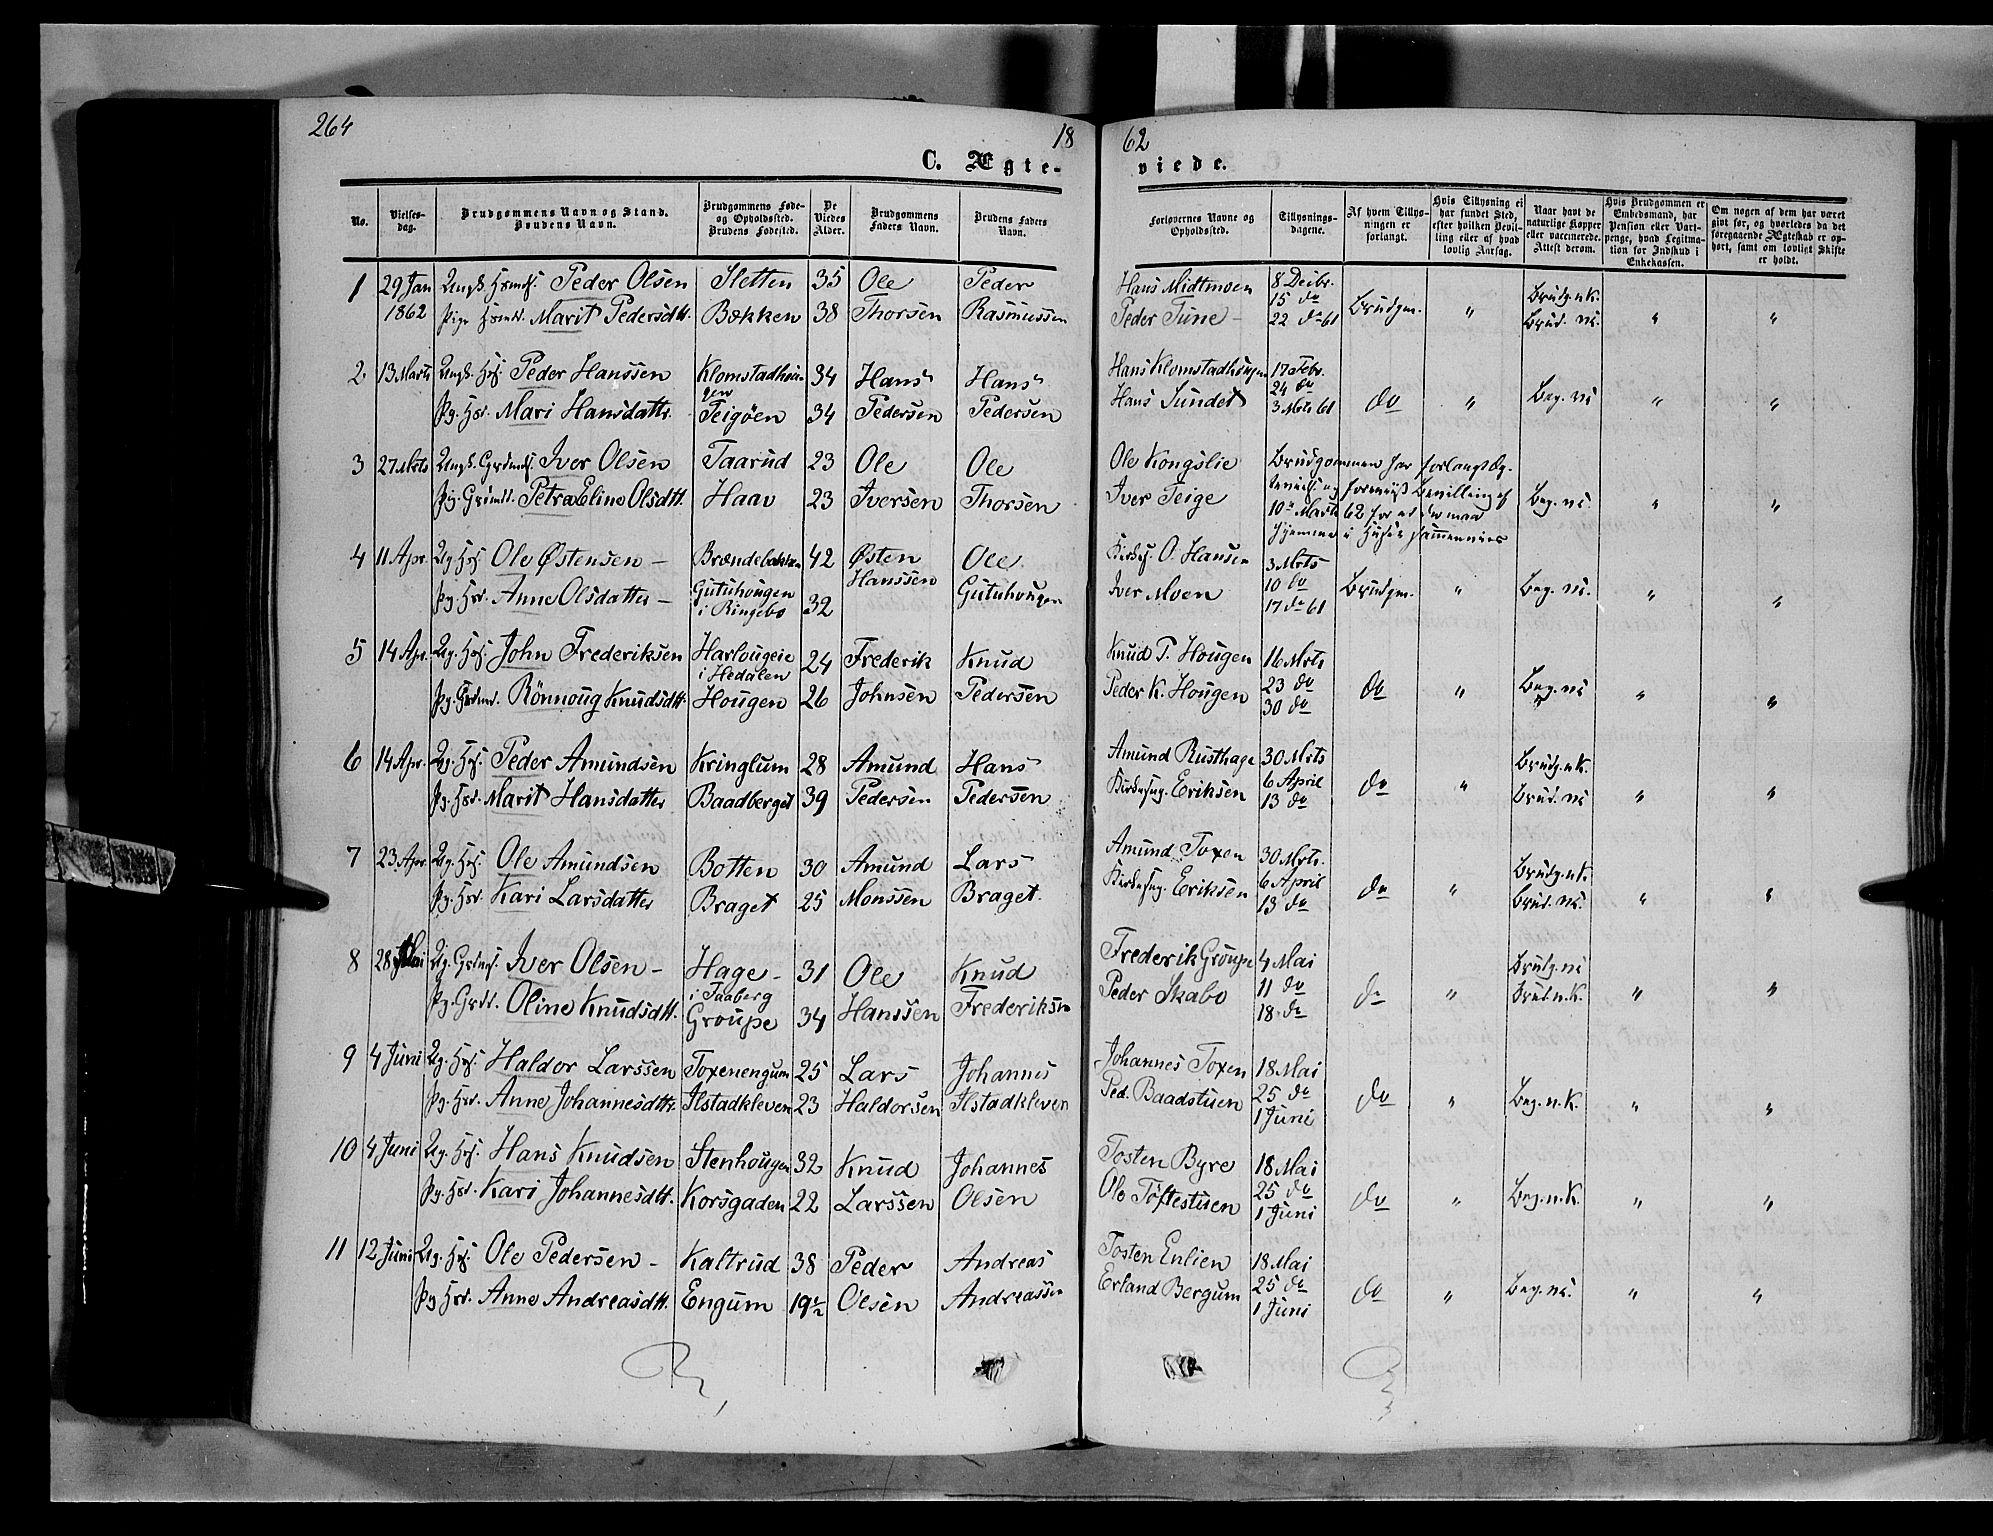 SAH, Nord-Fron prestekontor, Ministerialbok nr. 1, 1851-1864, s. 264